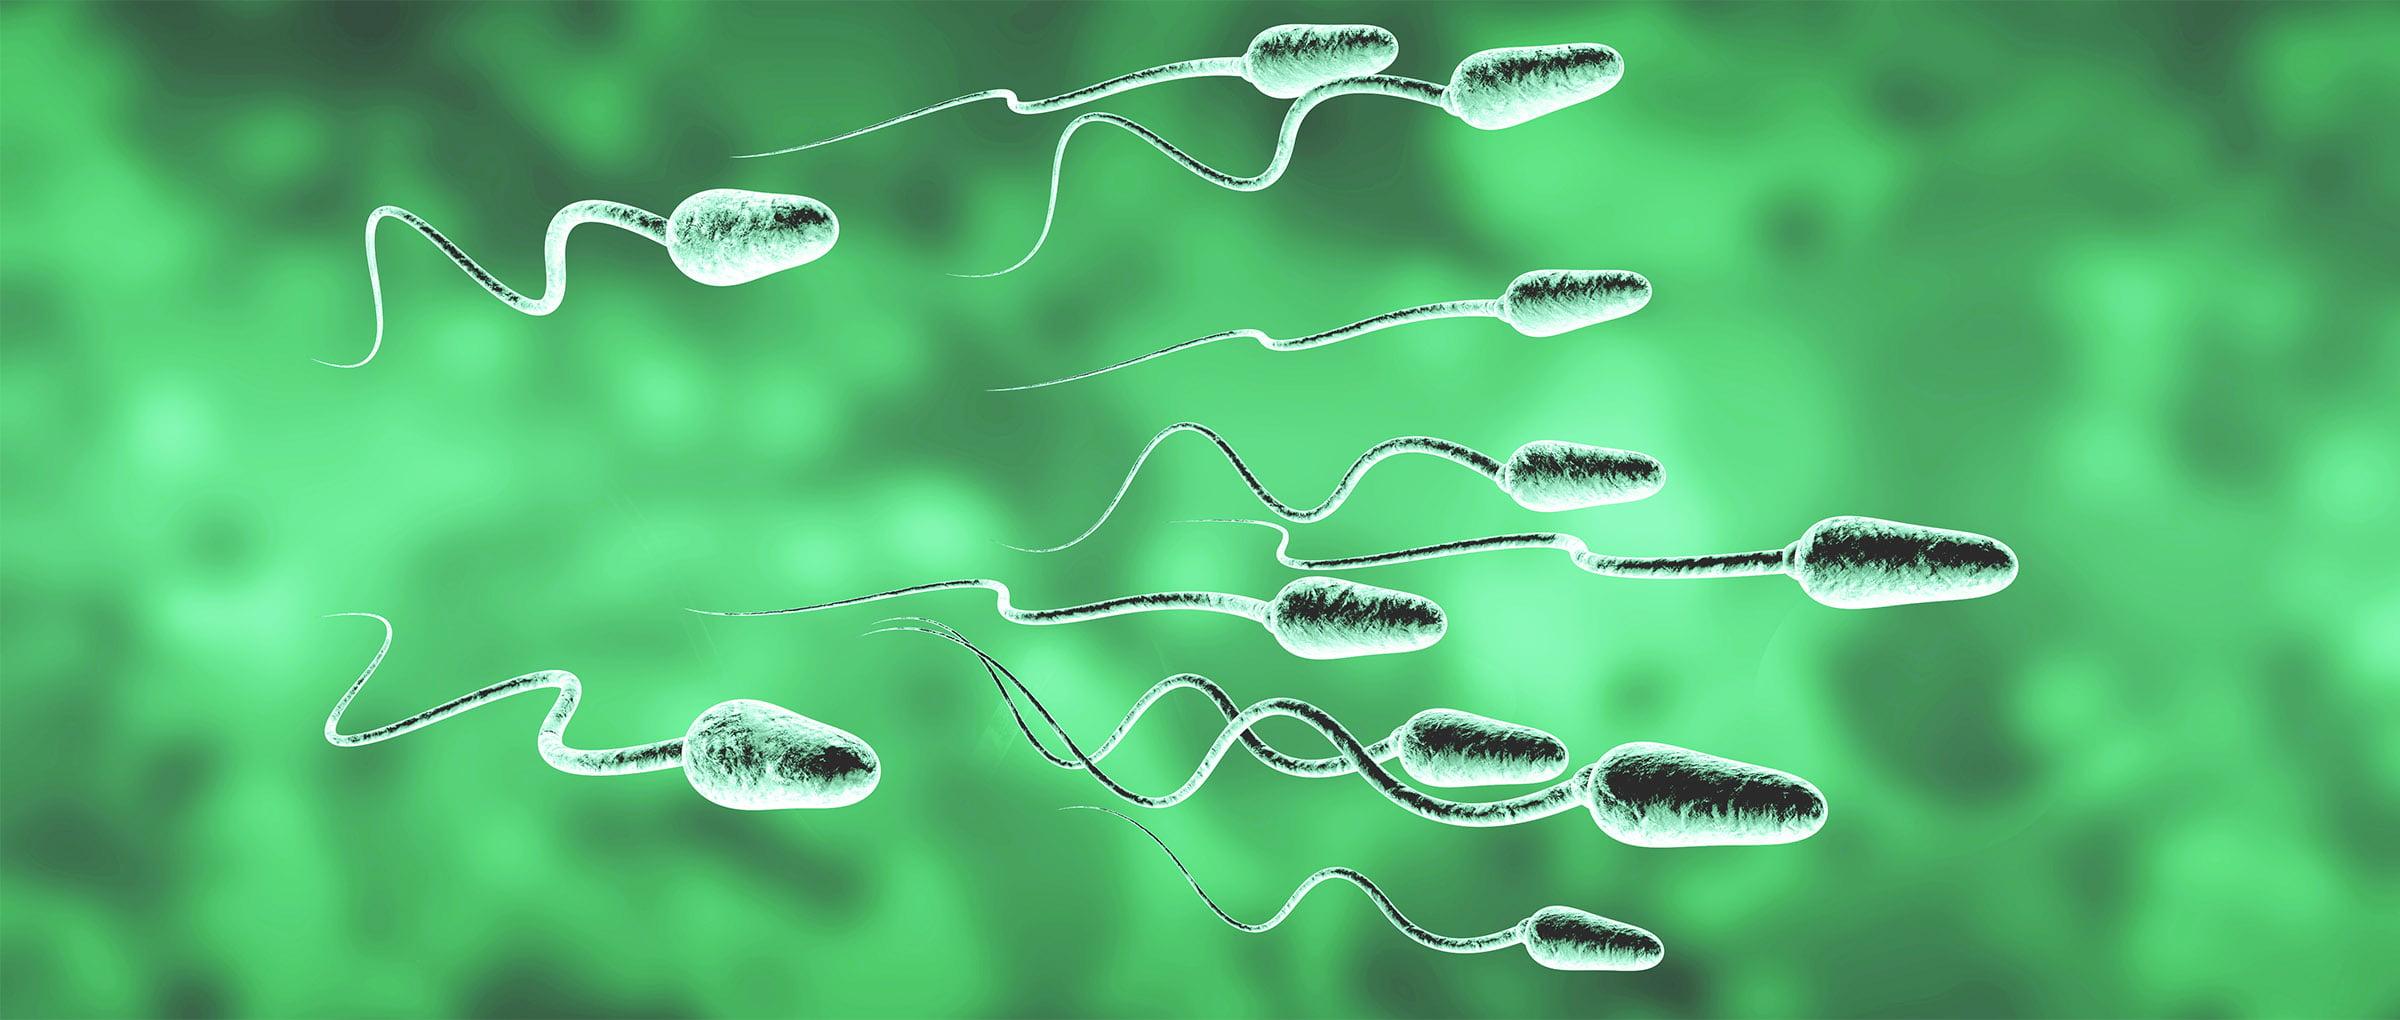 Use of donor sperm in Ukraine